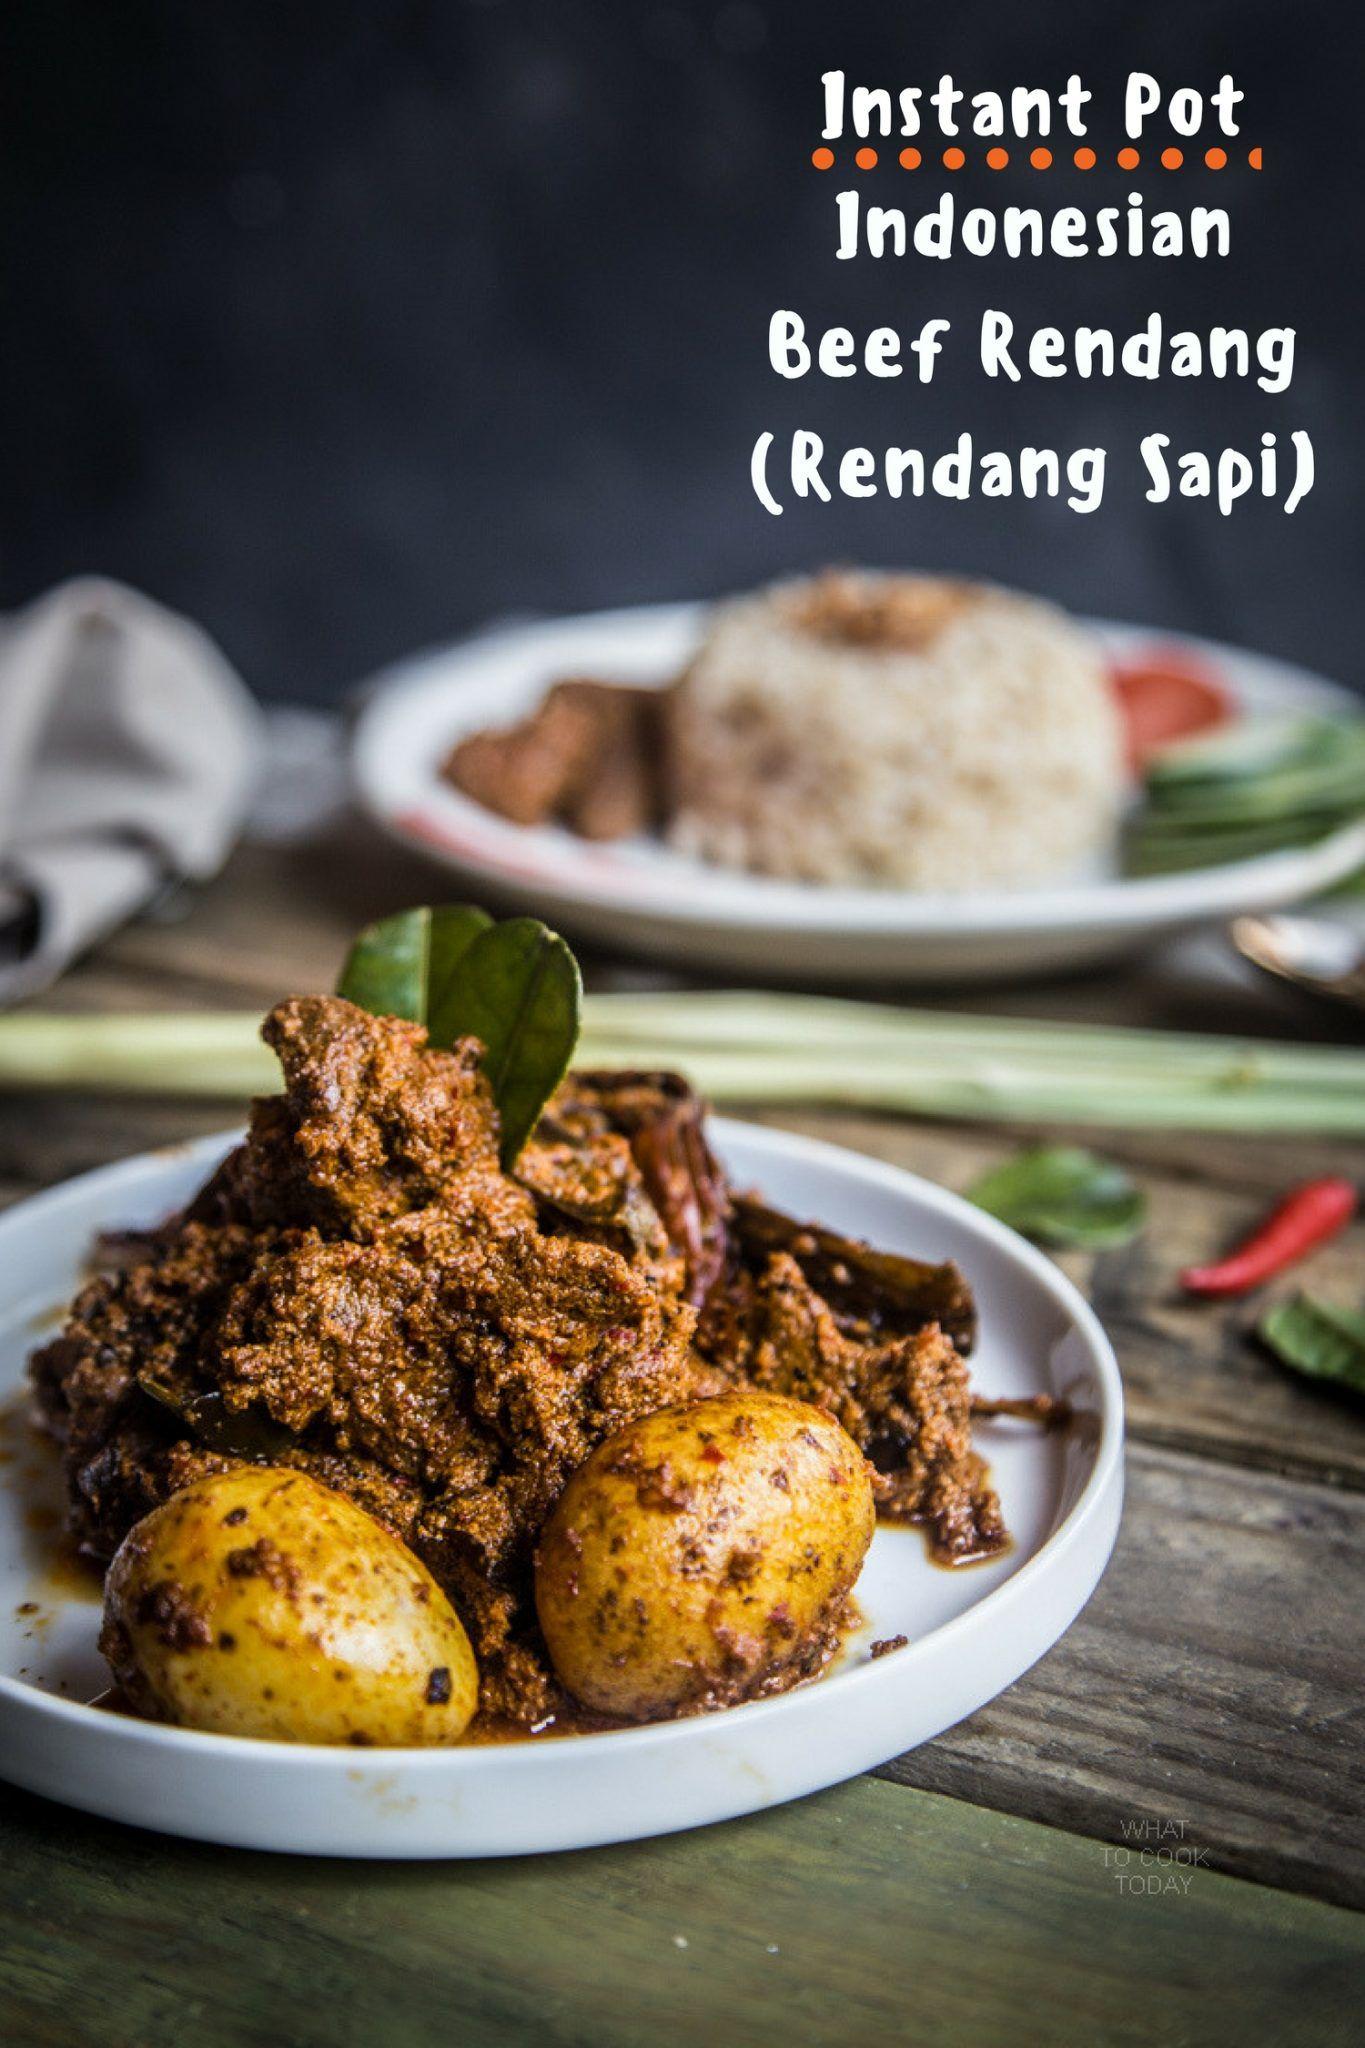 Rendang Sapi Indonesian Beef Rendang Instantpot Beefrendang